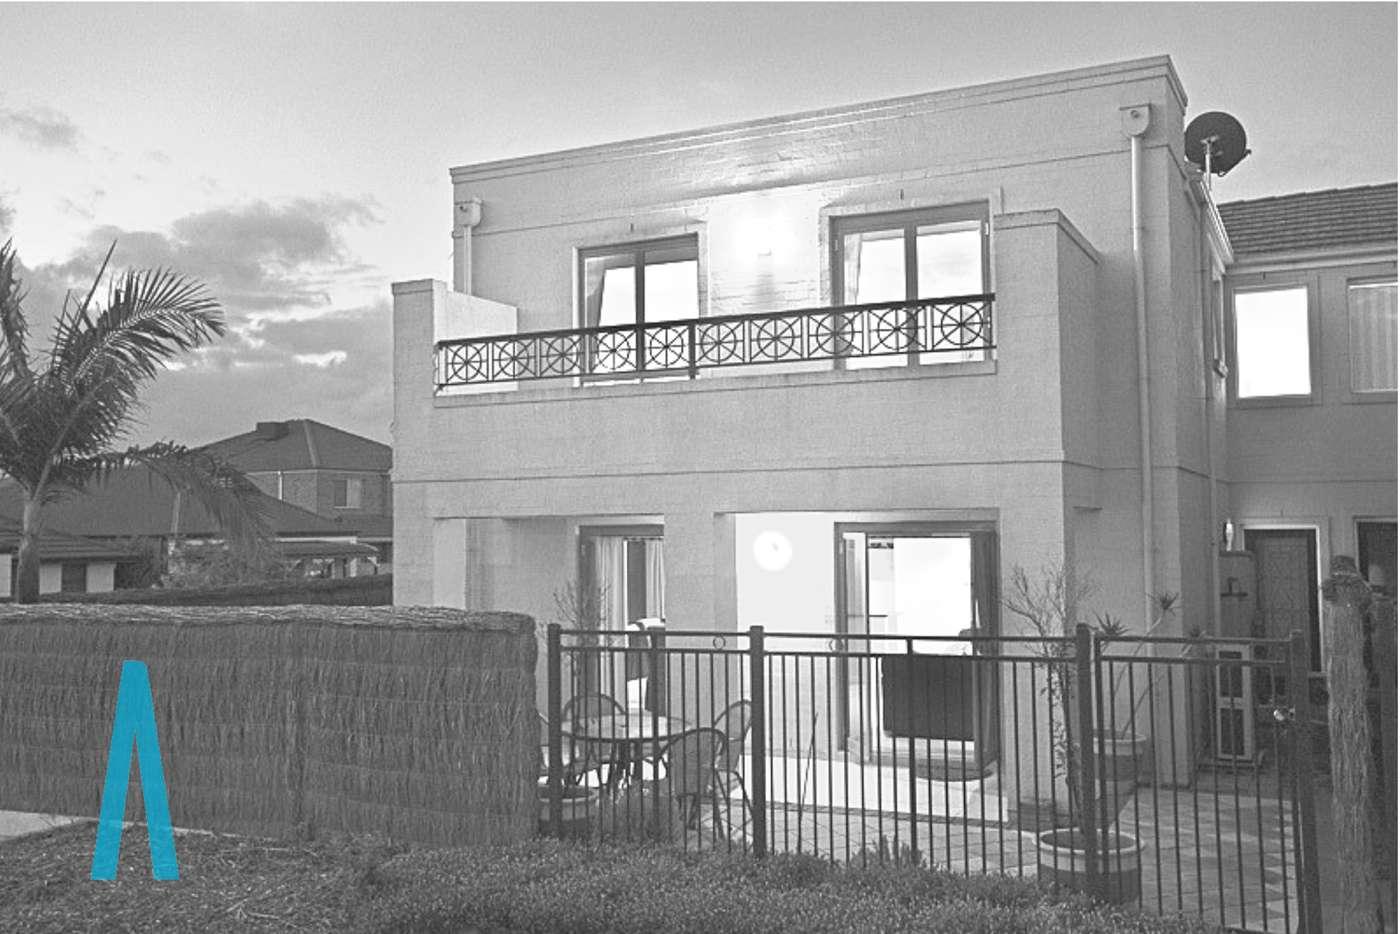 Main view of Homely house listing, 19 Lakeside Circuit, Northgate SA 5085